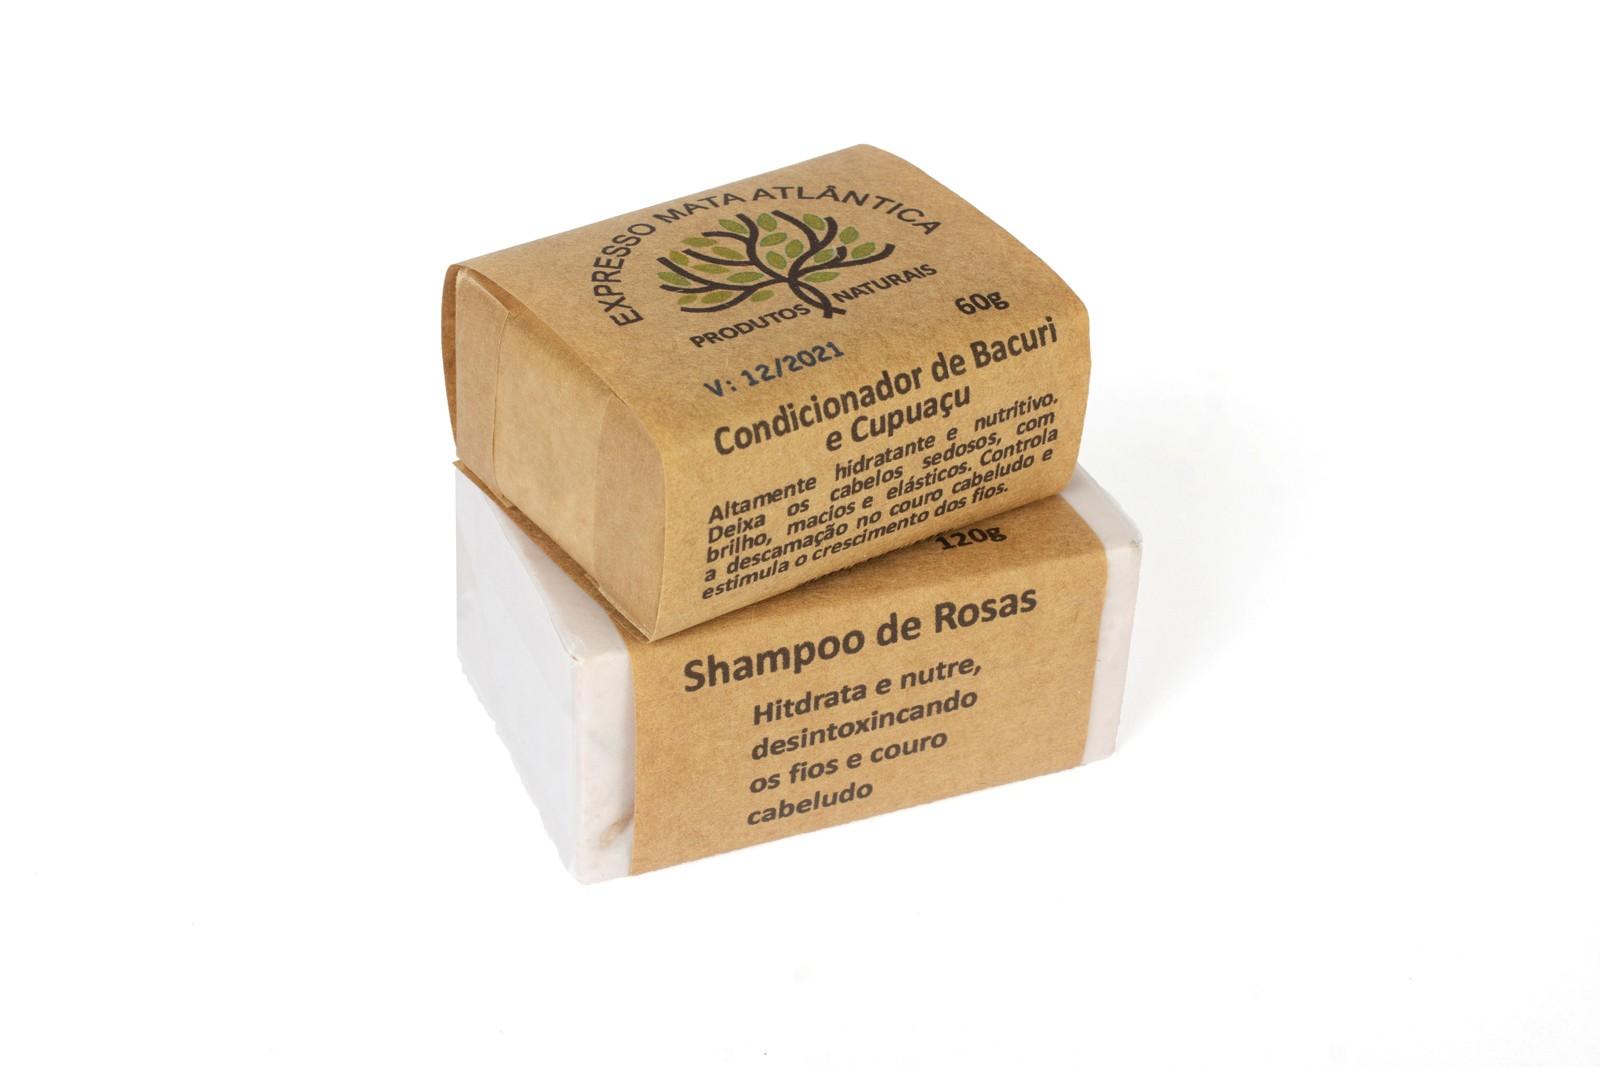 Condicionador barra de Bacurí e Shampoo barra Rosas da Expresso Mata Atlântica